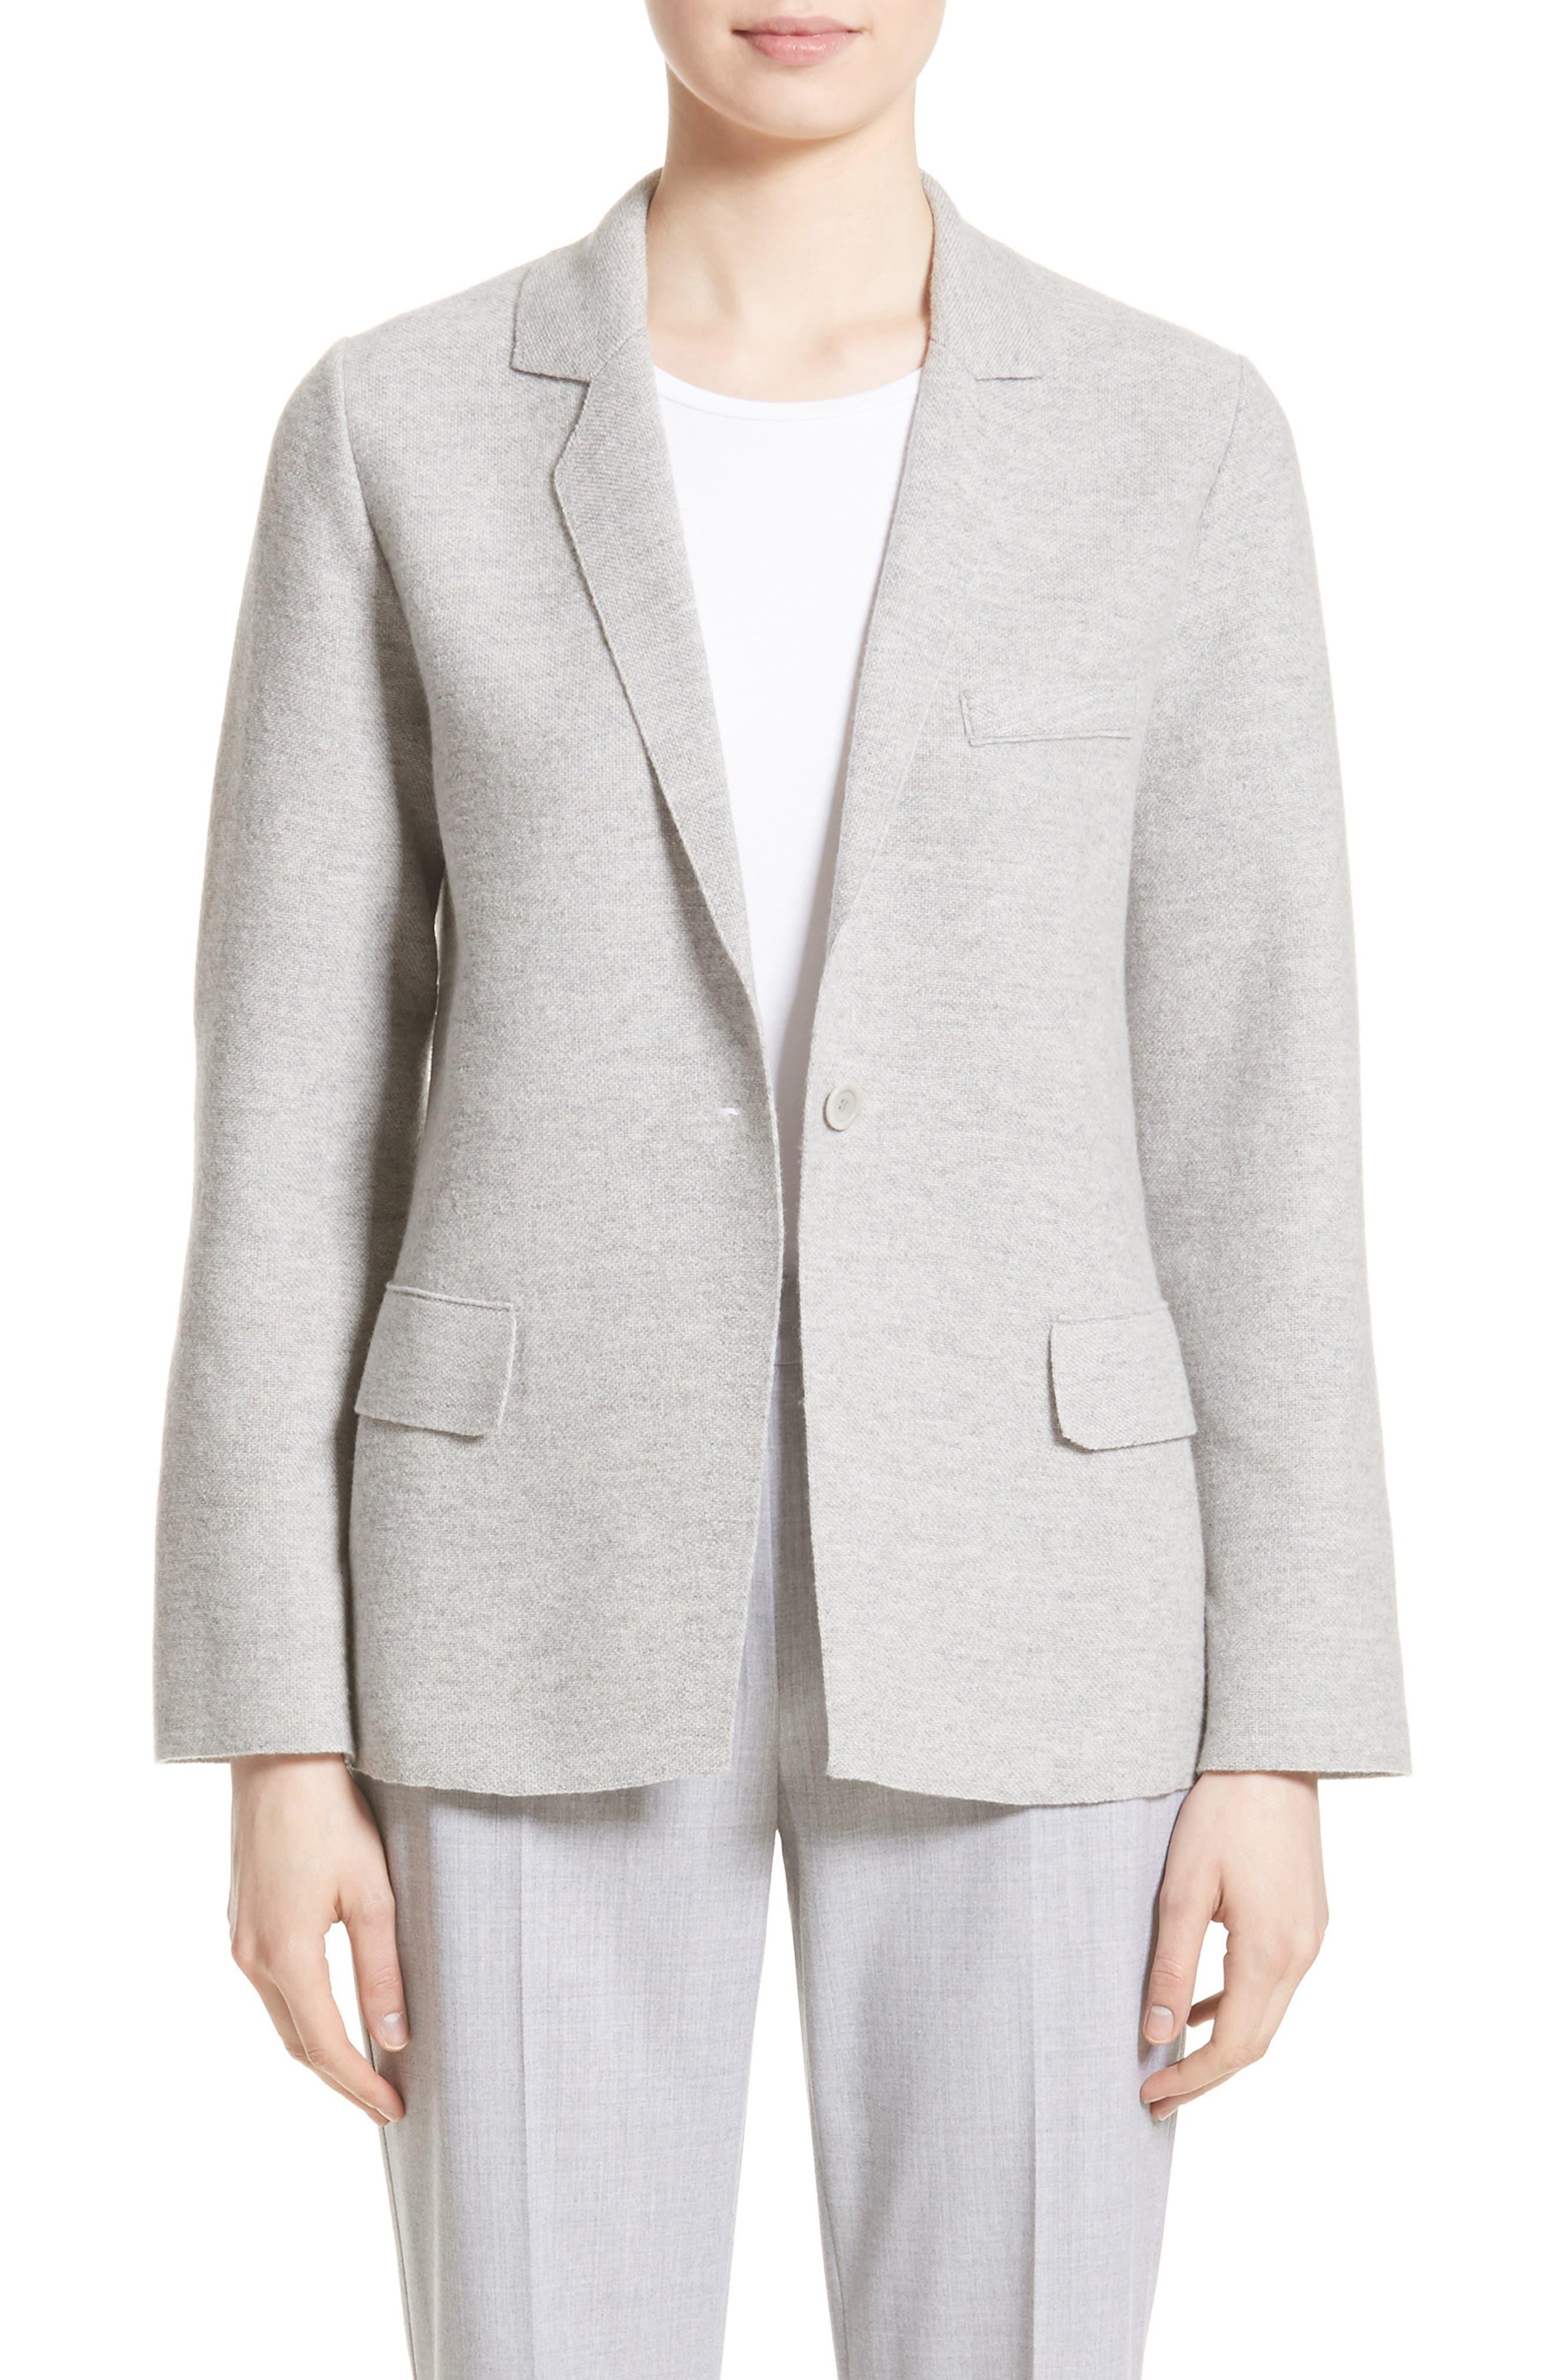 Alternate Image 1 Selected - Max Mara Segnale Cashmere Jacket